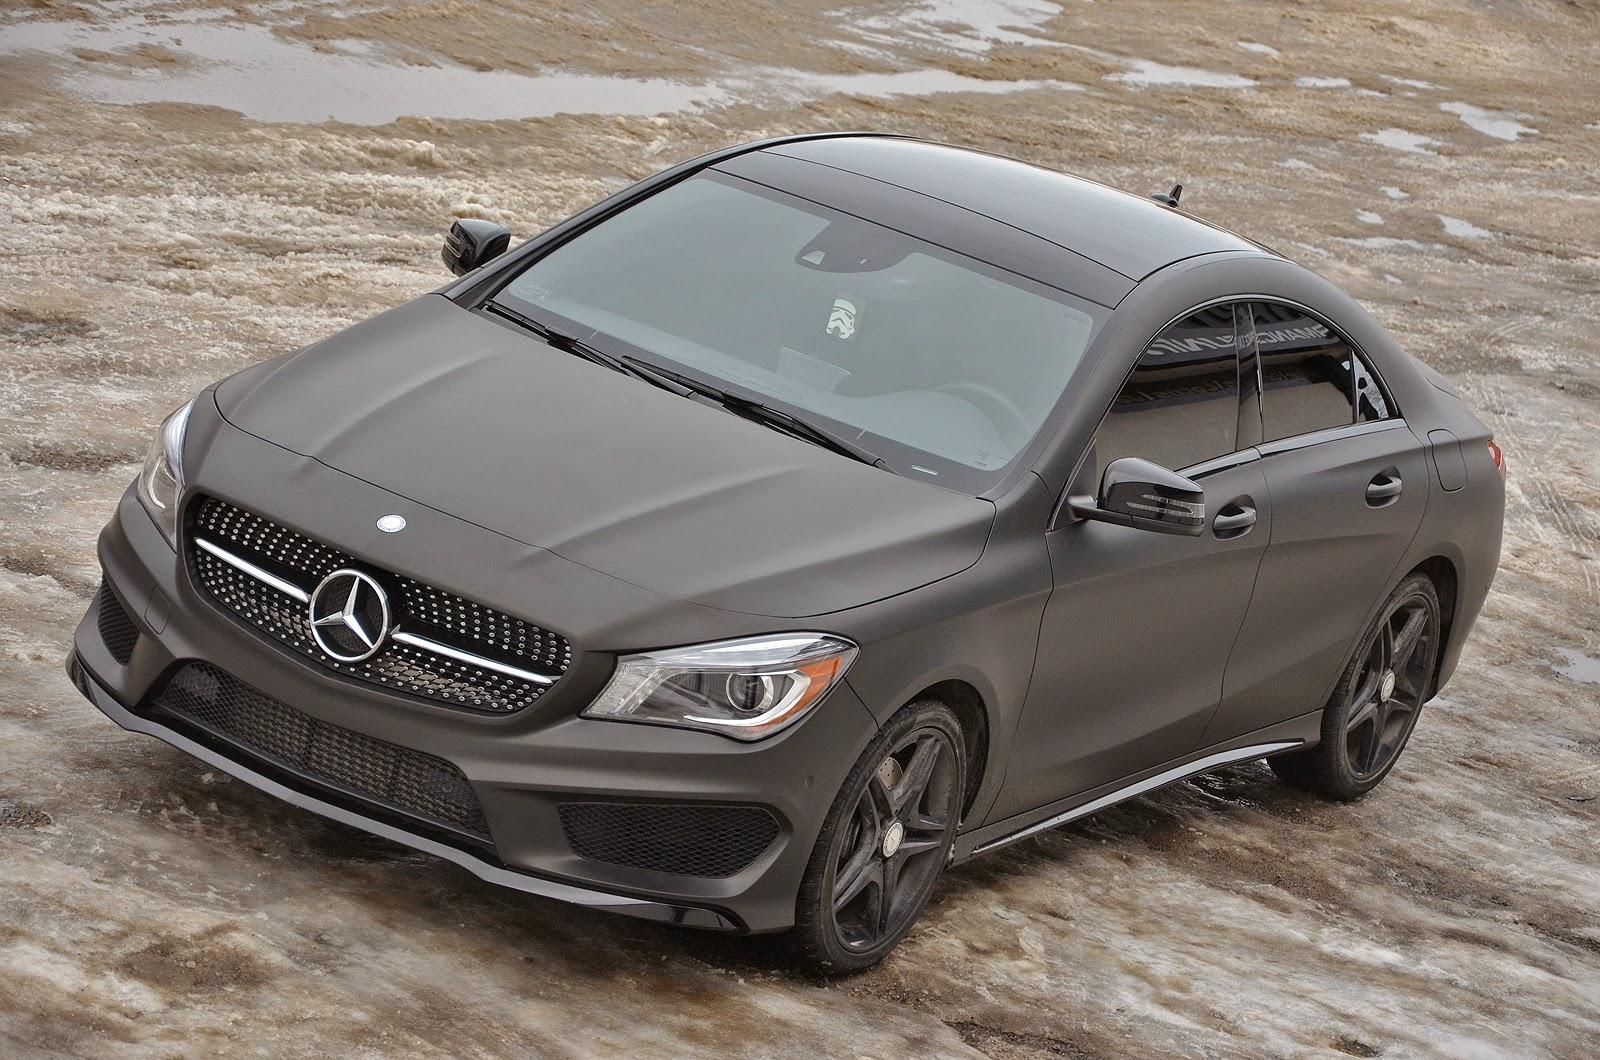 Mercedes cla 250 matte black the image for Mercedes benz matte black